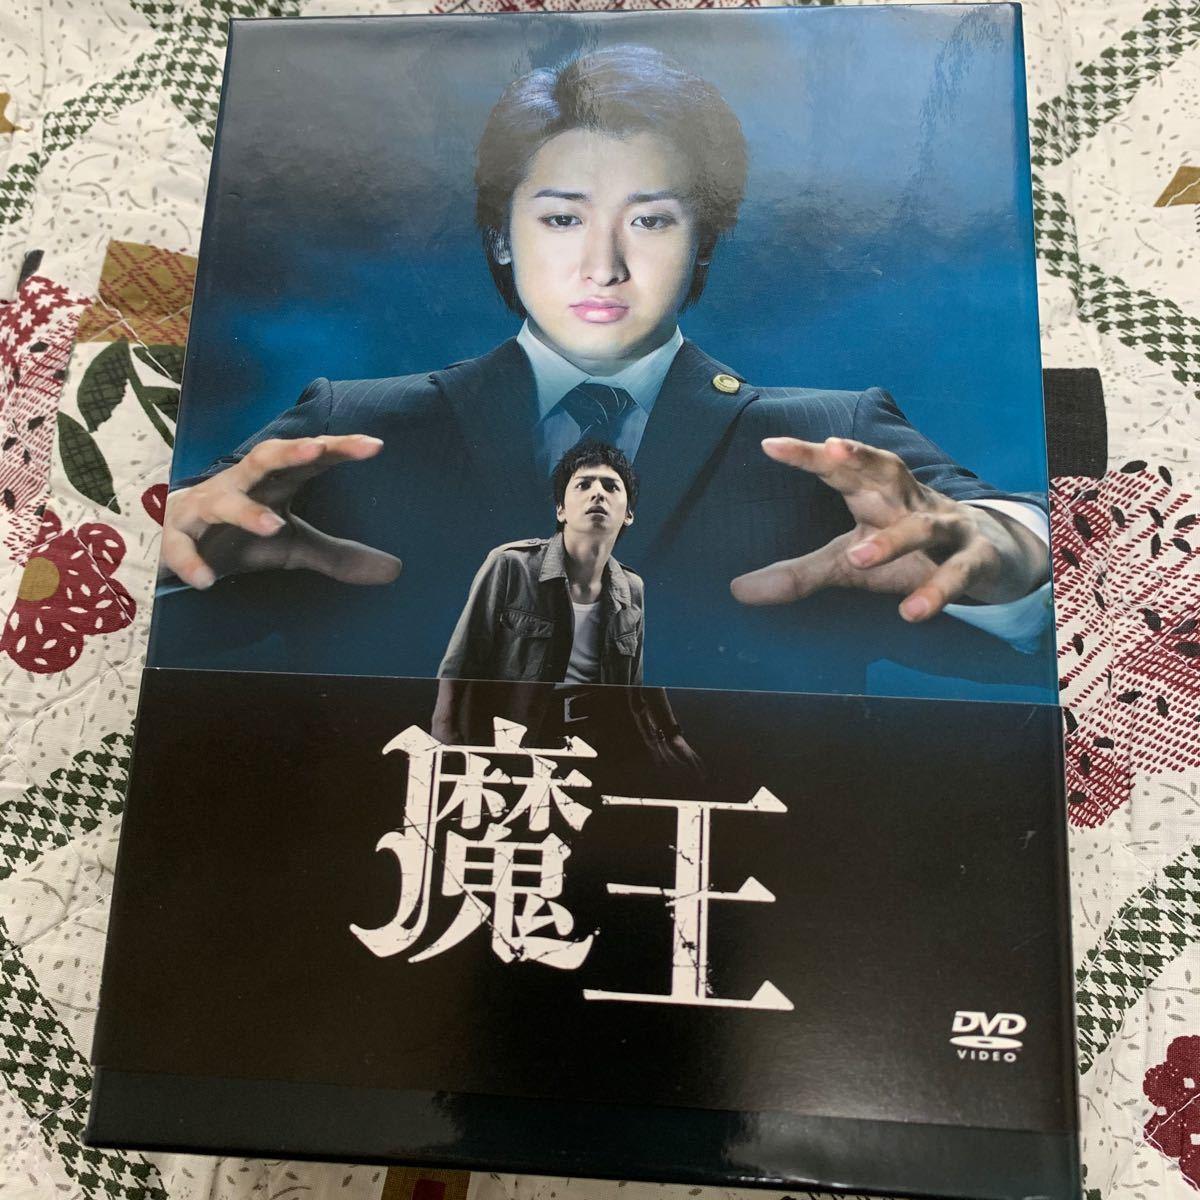 お値下げ!DVD「魔王」 大野智 主演 生田斗真 DVD-BOX